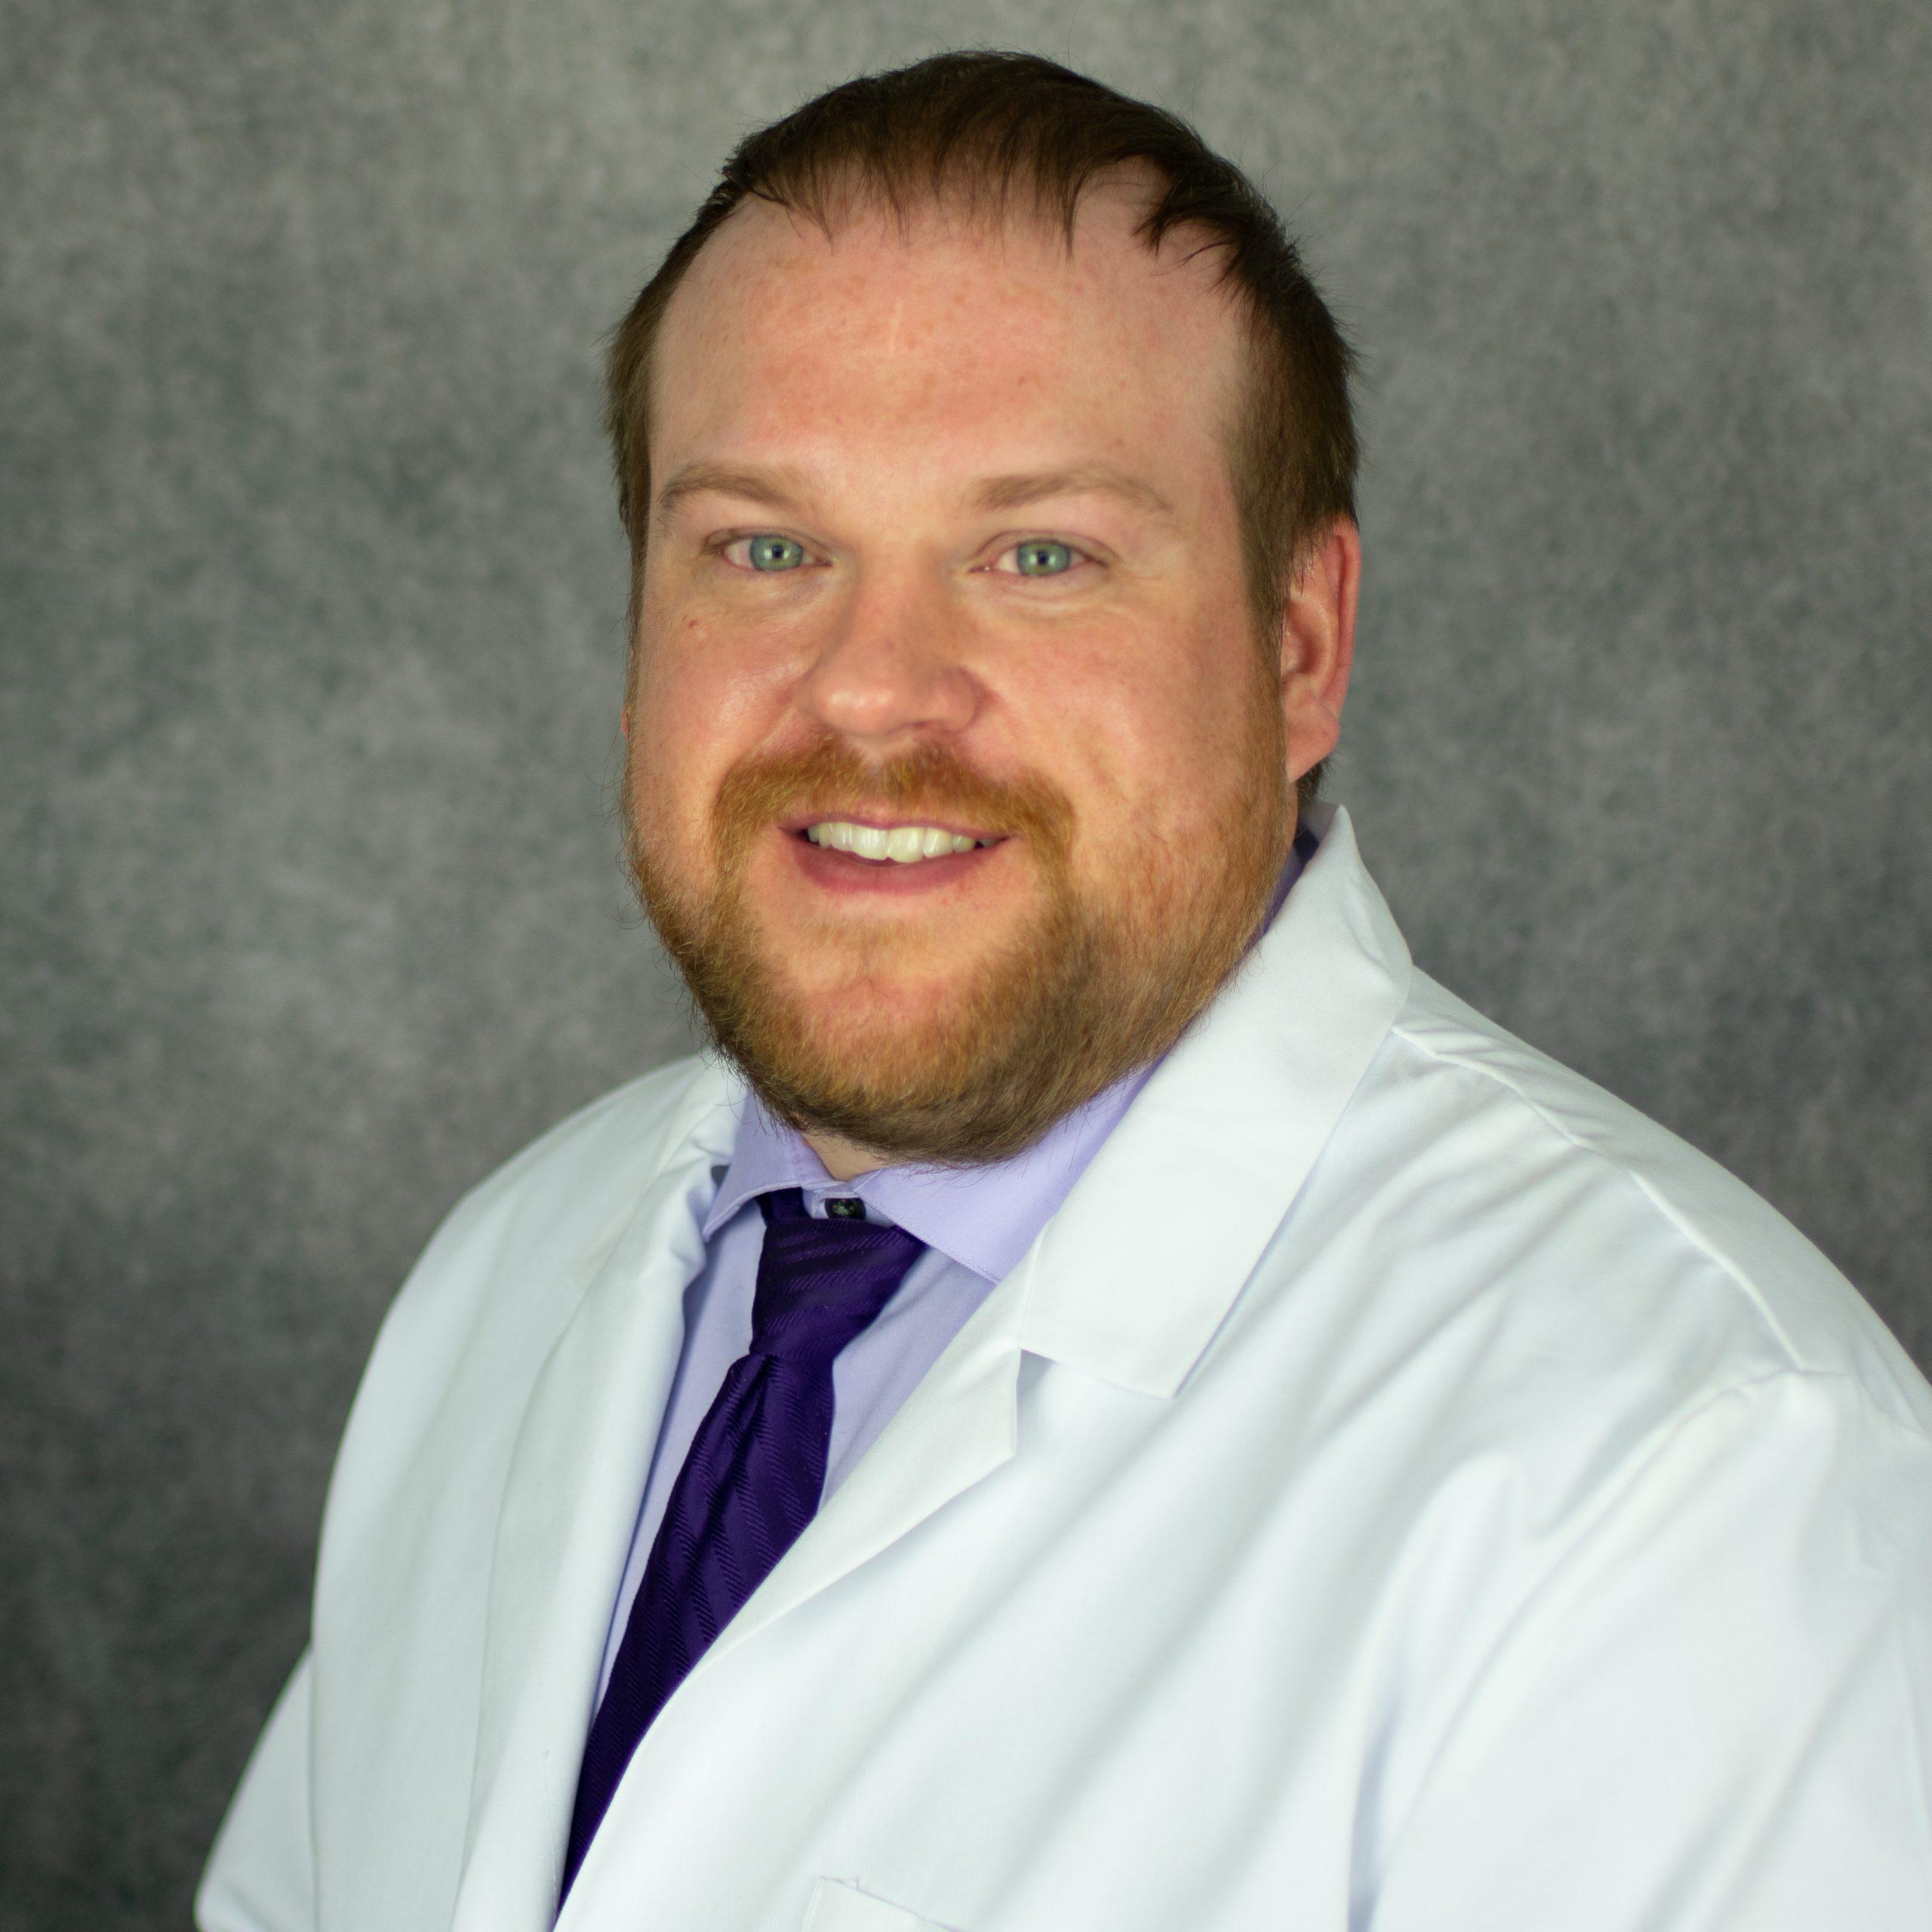 Dr. Connors - Shopko Optical Optometrist